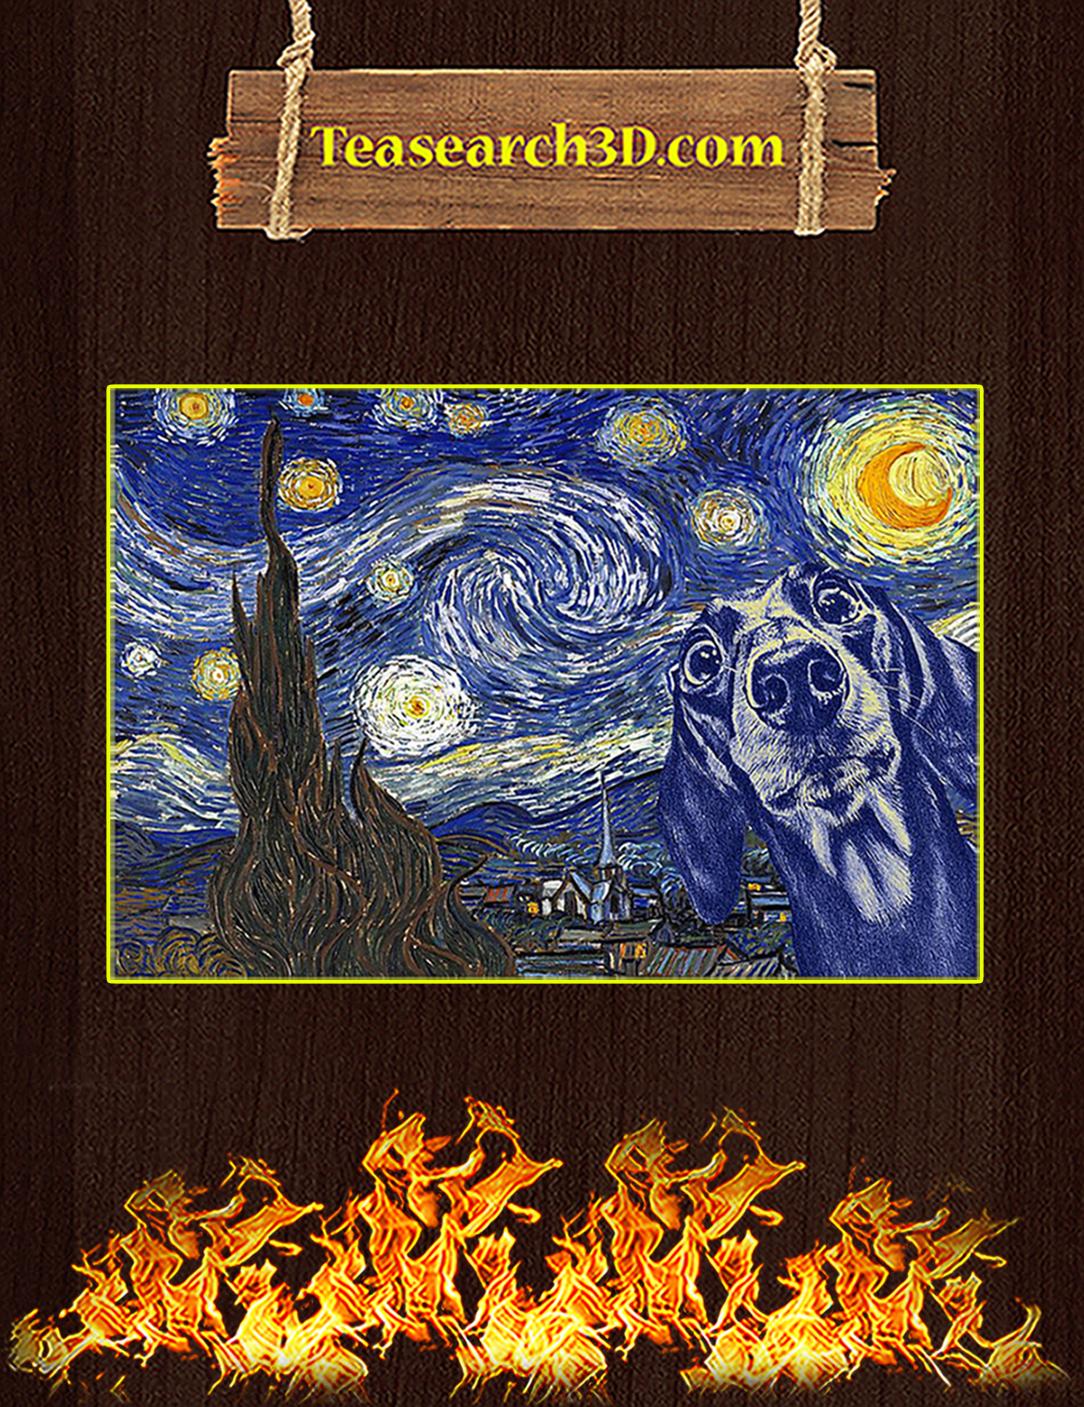 Dachshund van gogh starry night poster A2